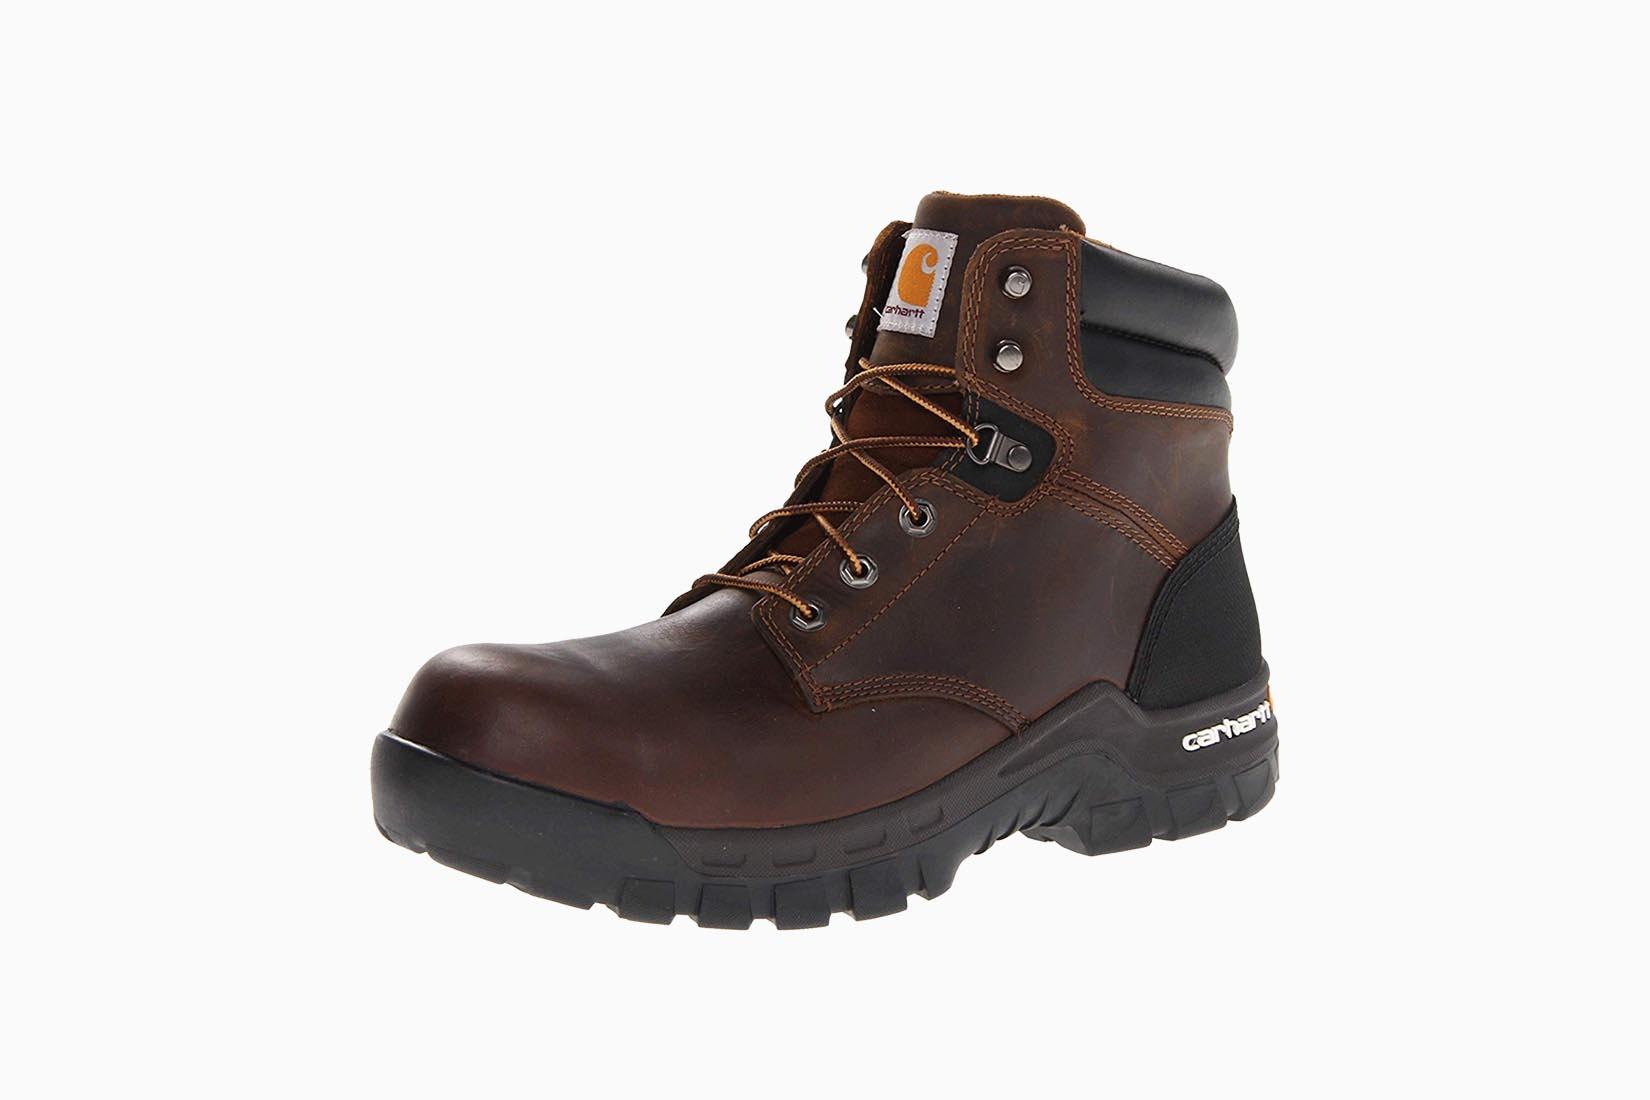 best boots men carhartt composite toe boot review Luxe Digital